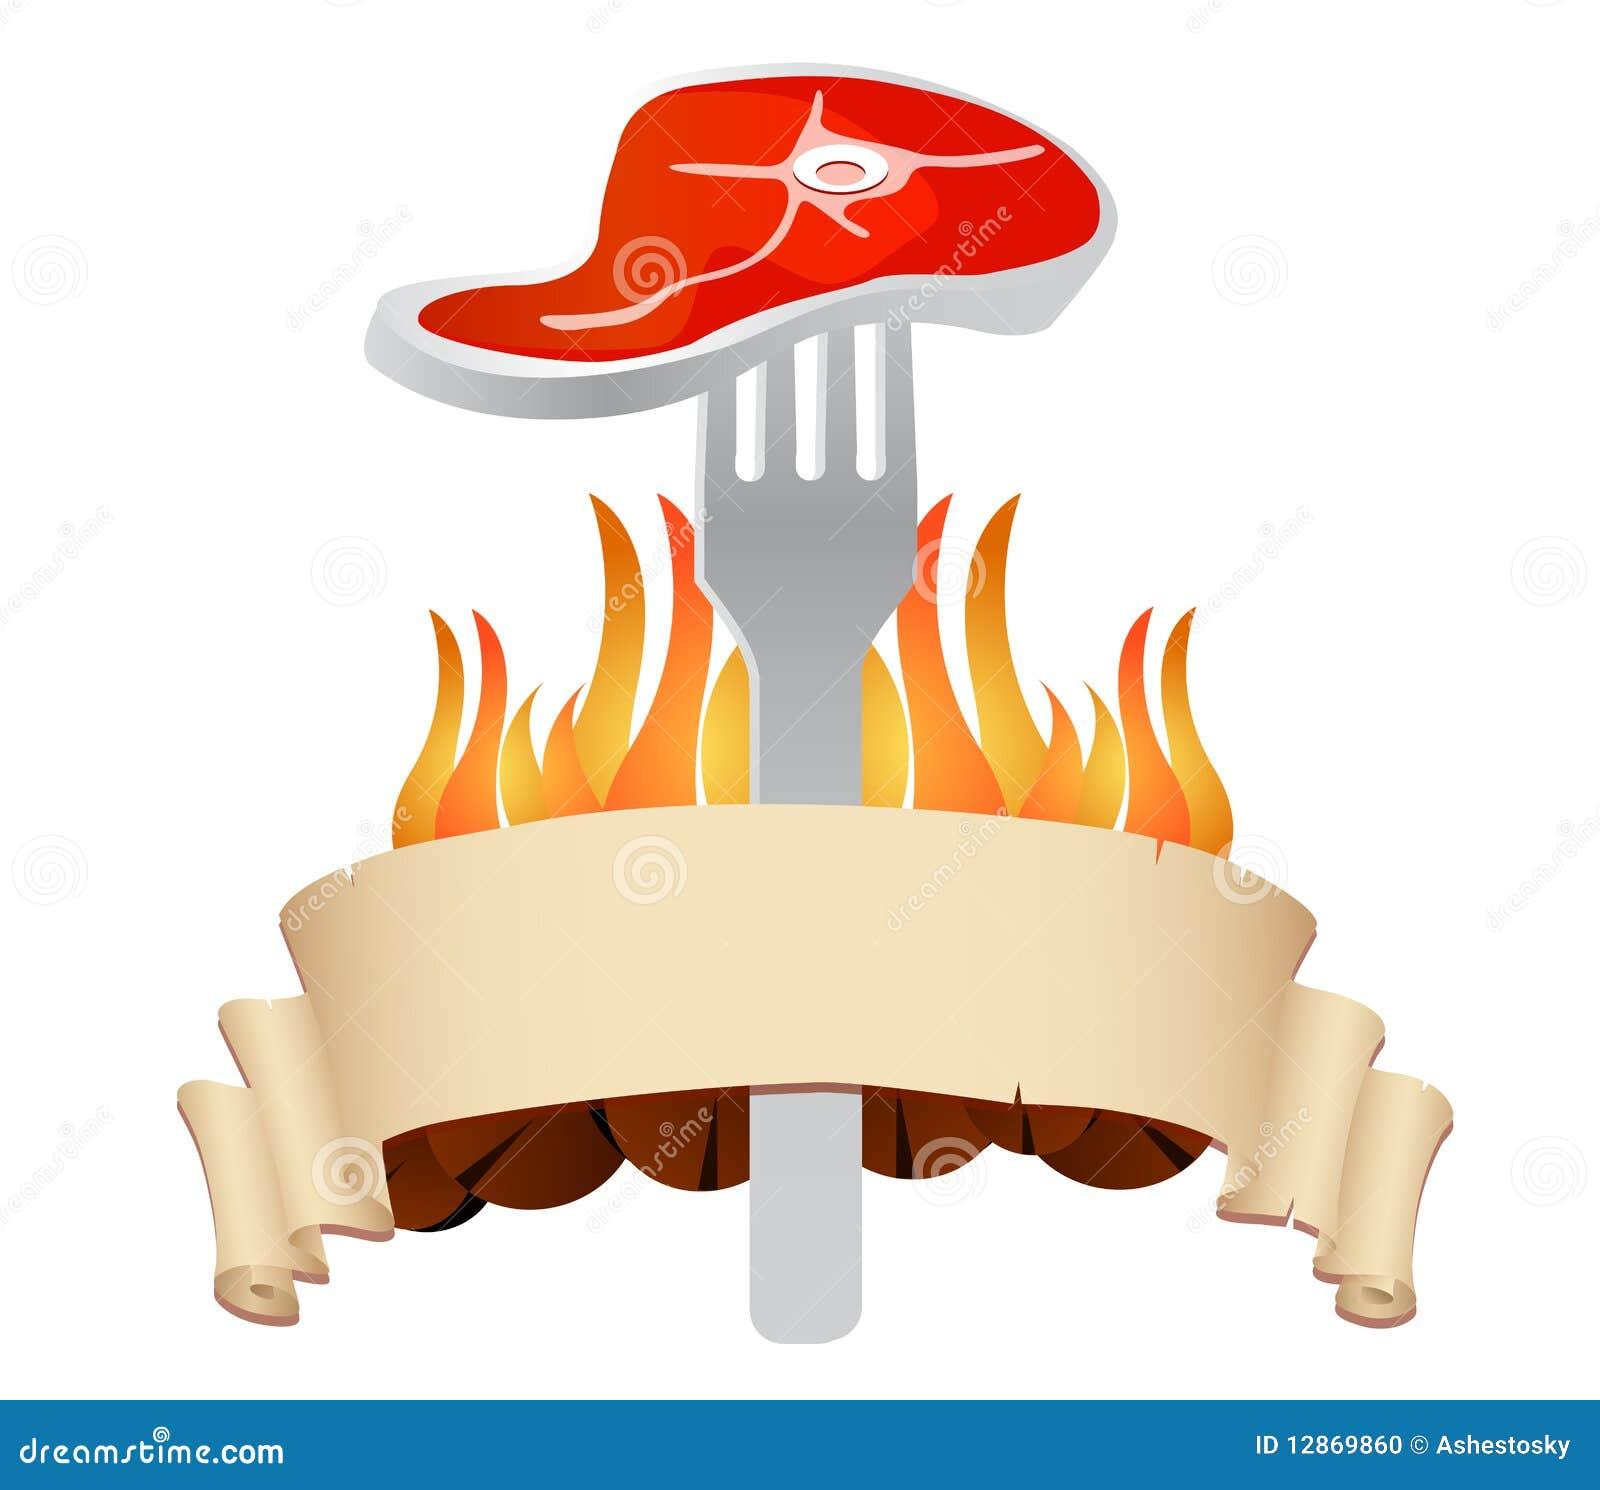 restaurant logo clipart - photo #44